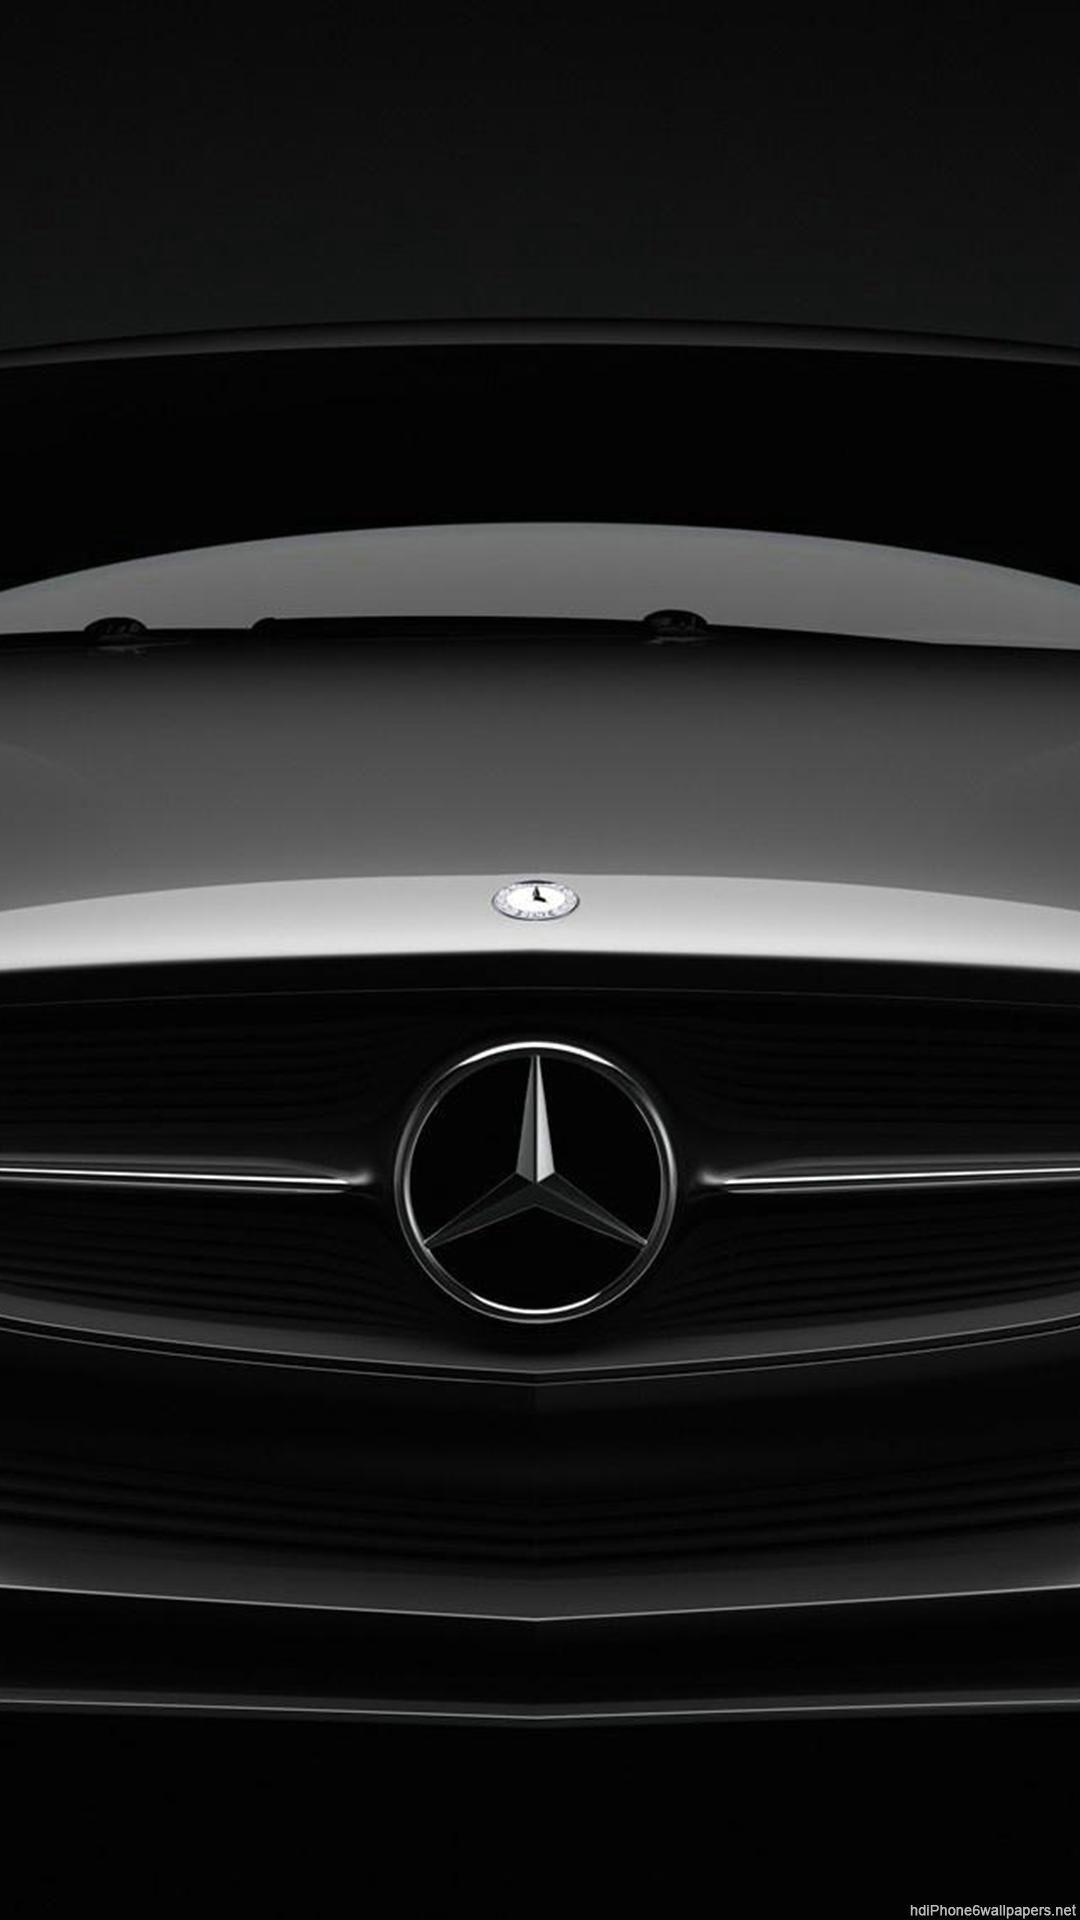 Mercedes Benz Iphone 6 Plus Wallpapers Top Free Mercedes Benz